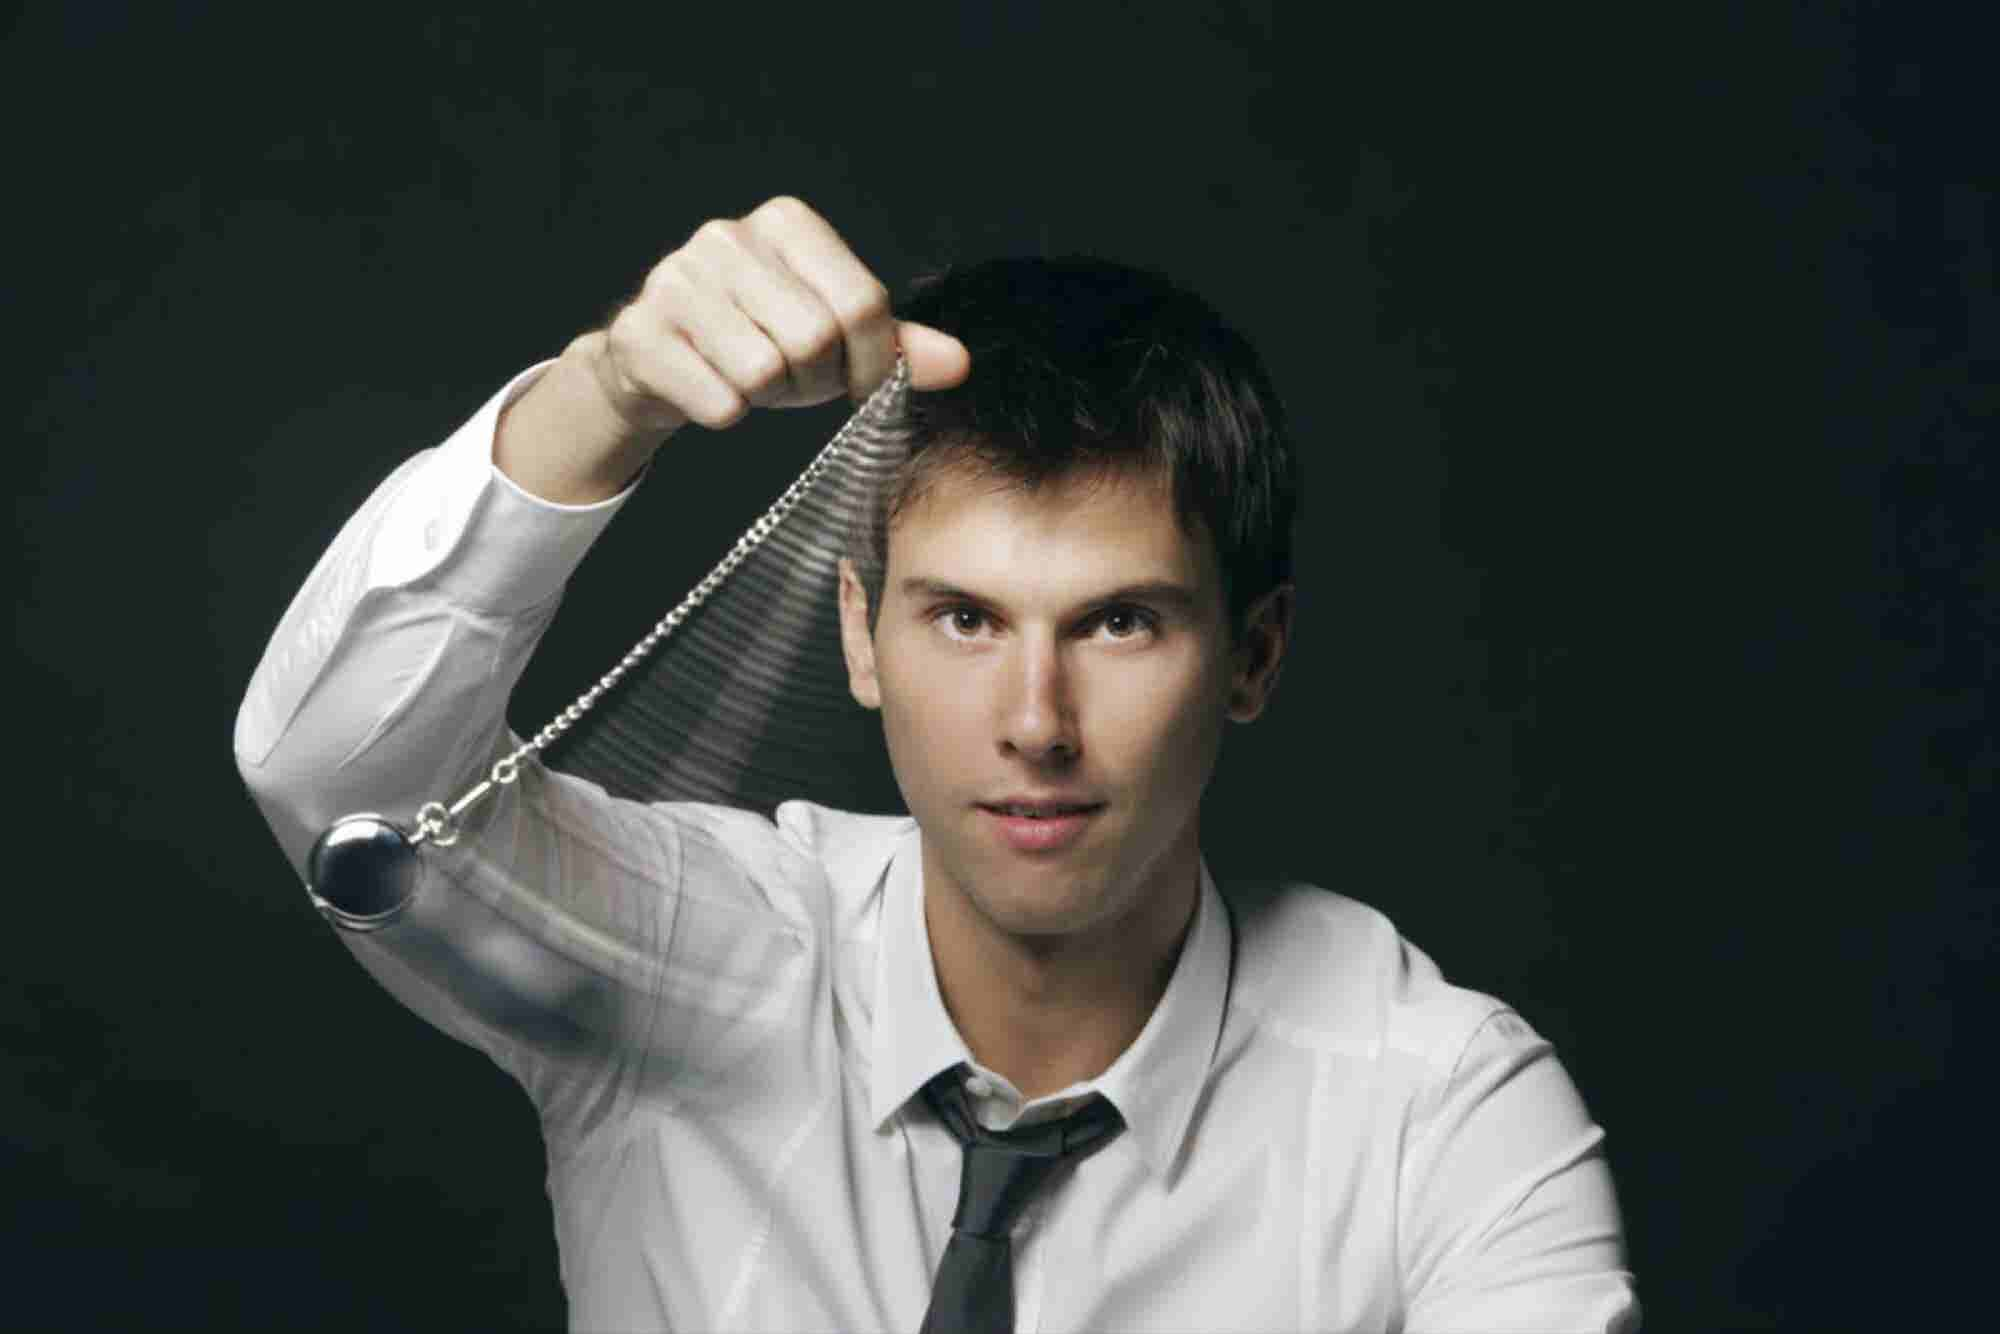 15 secretos de las personas persuasivas